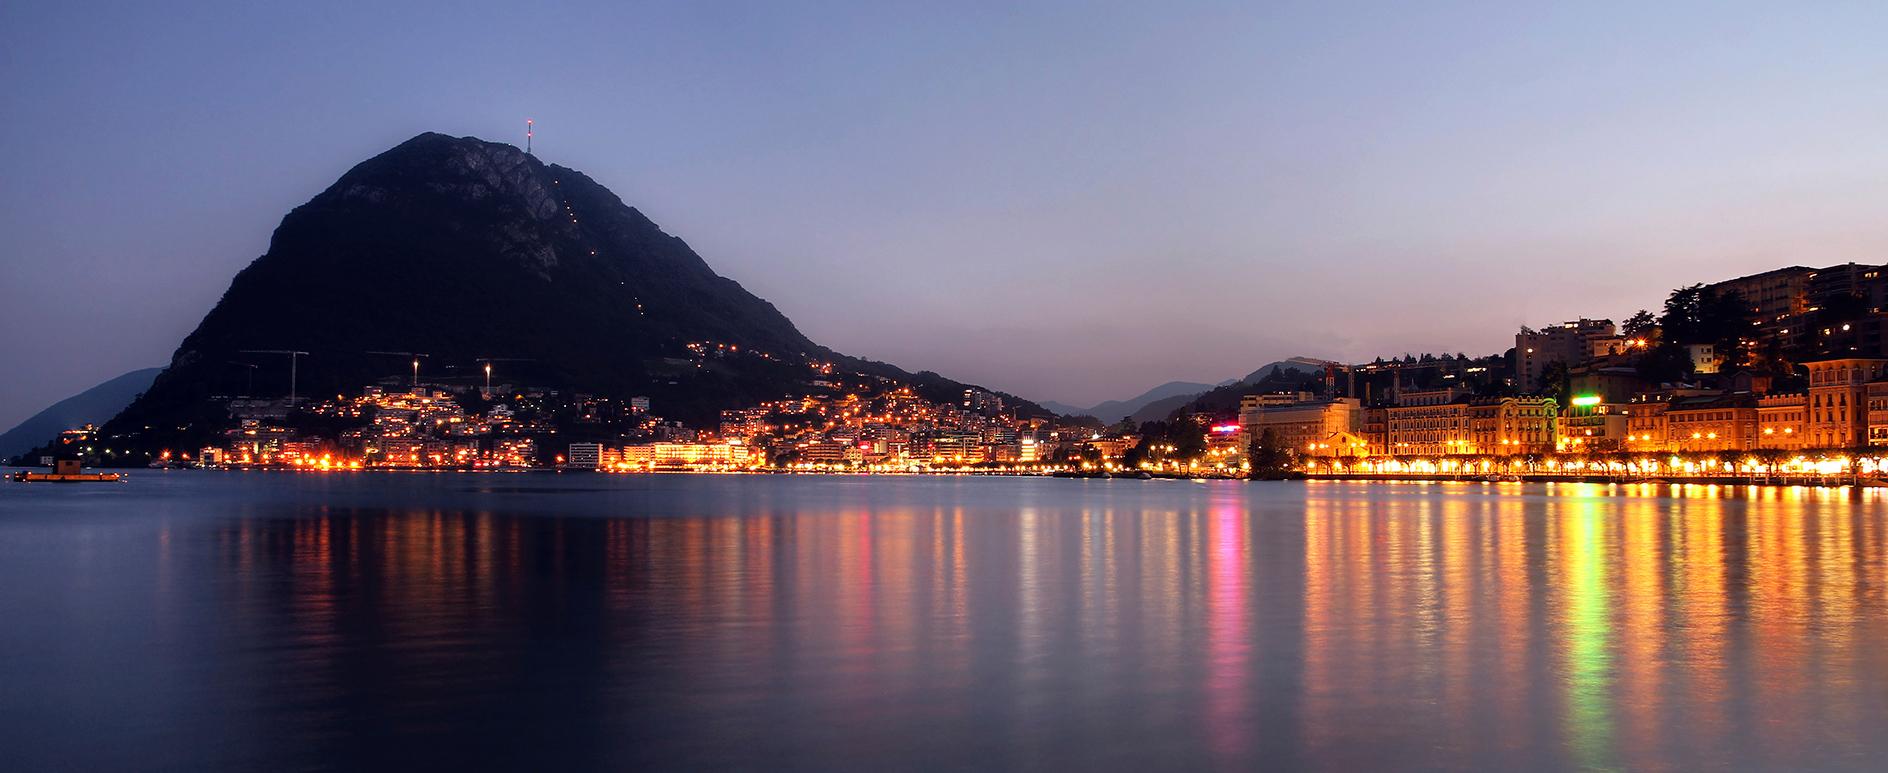 CHY_Lugano_Ticino_Switzerland